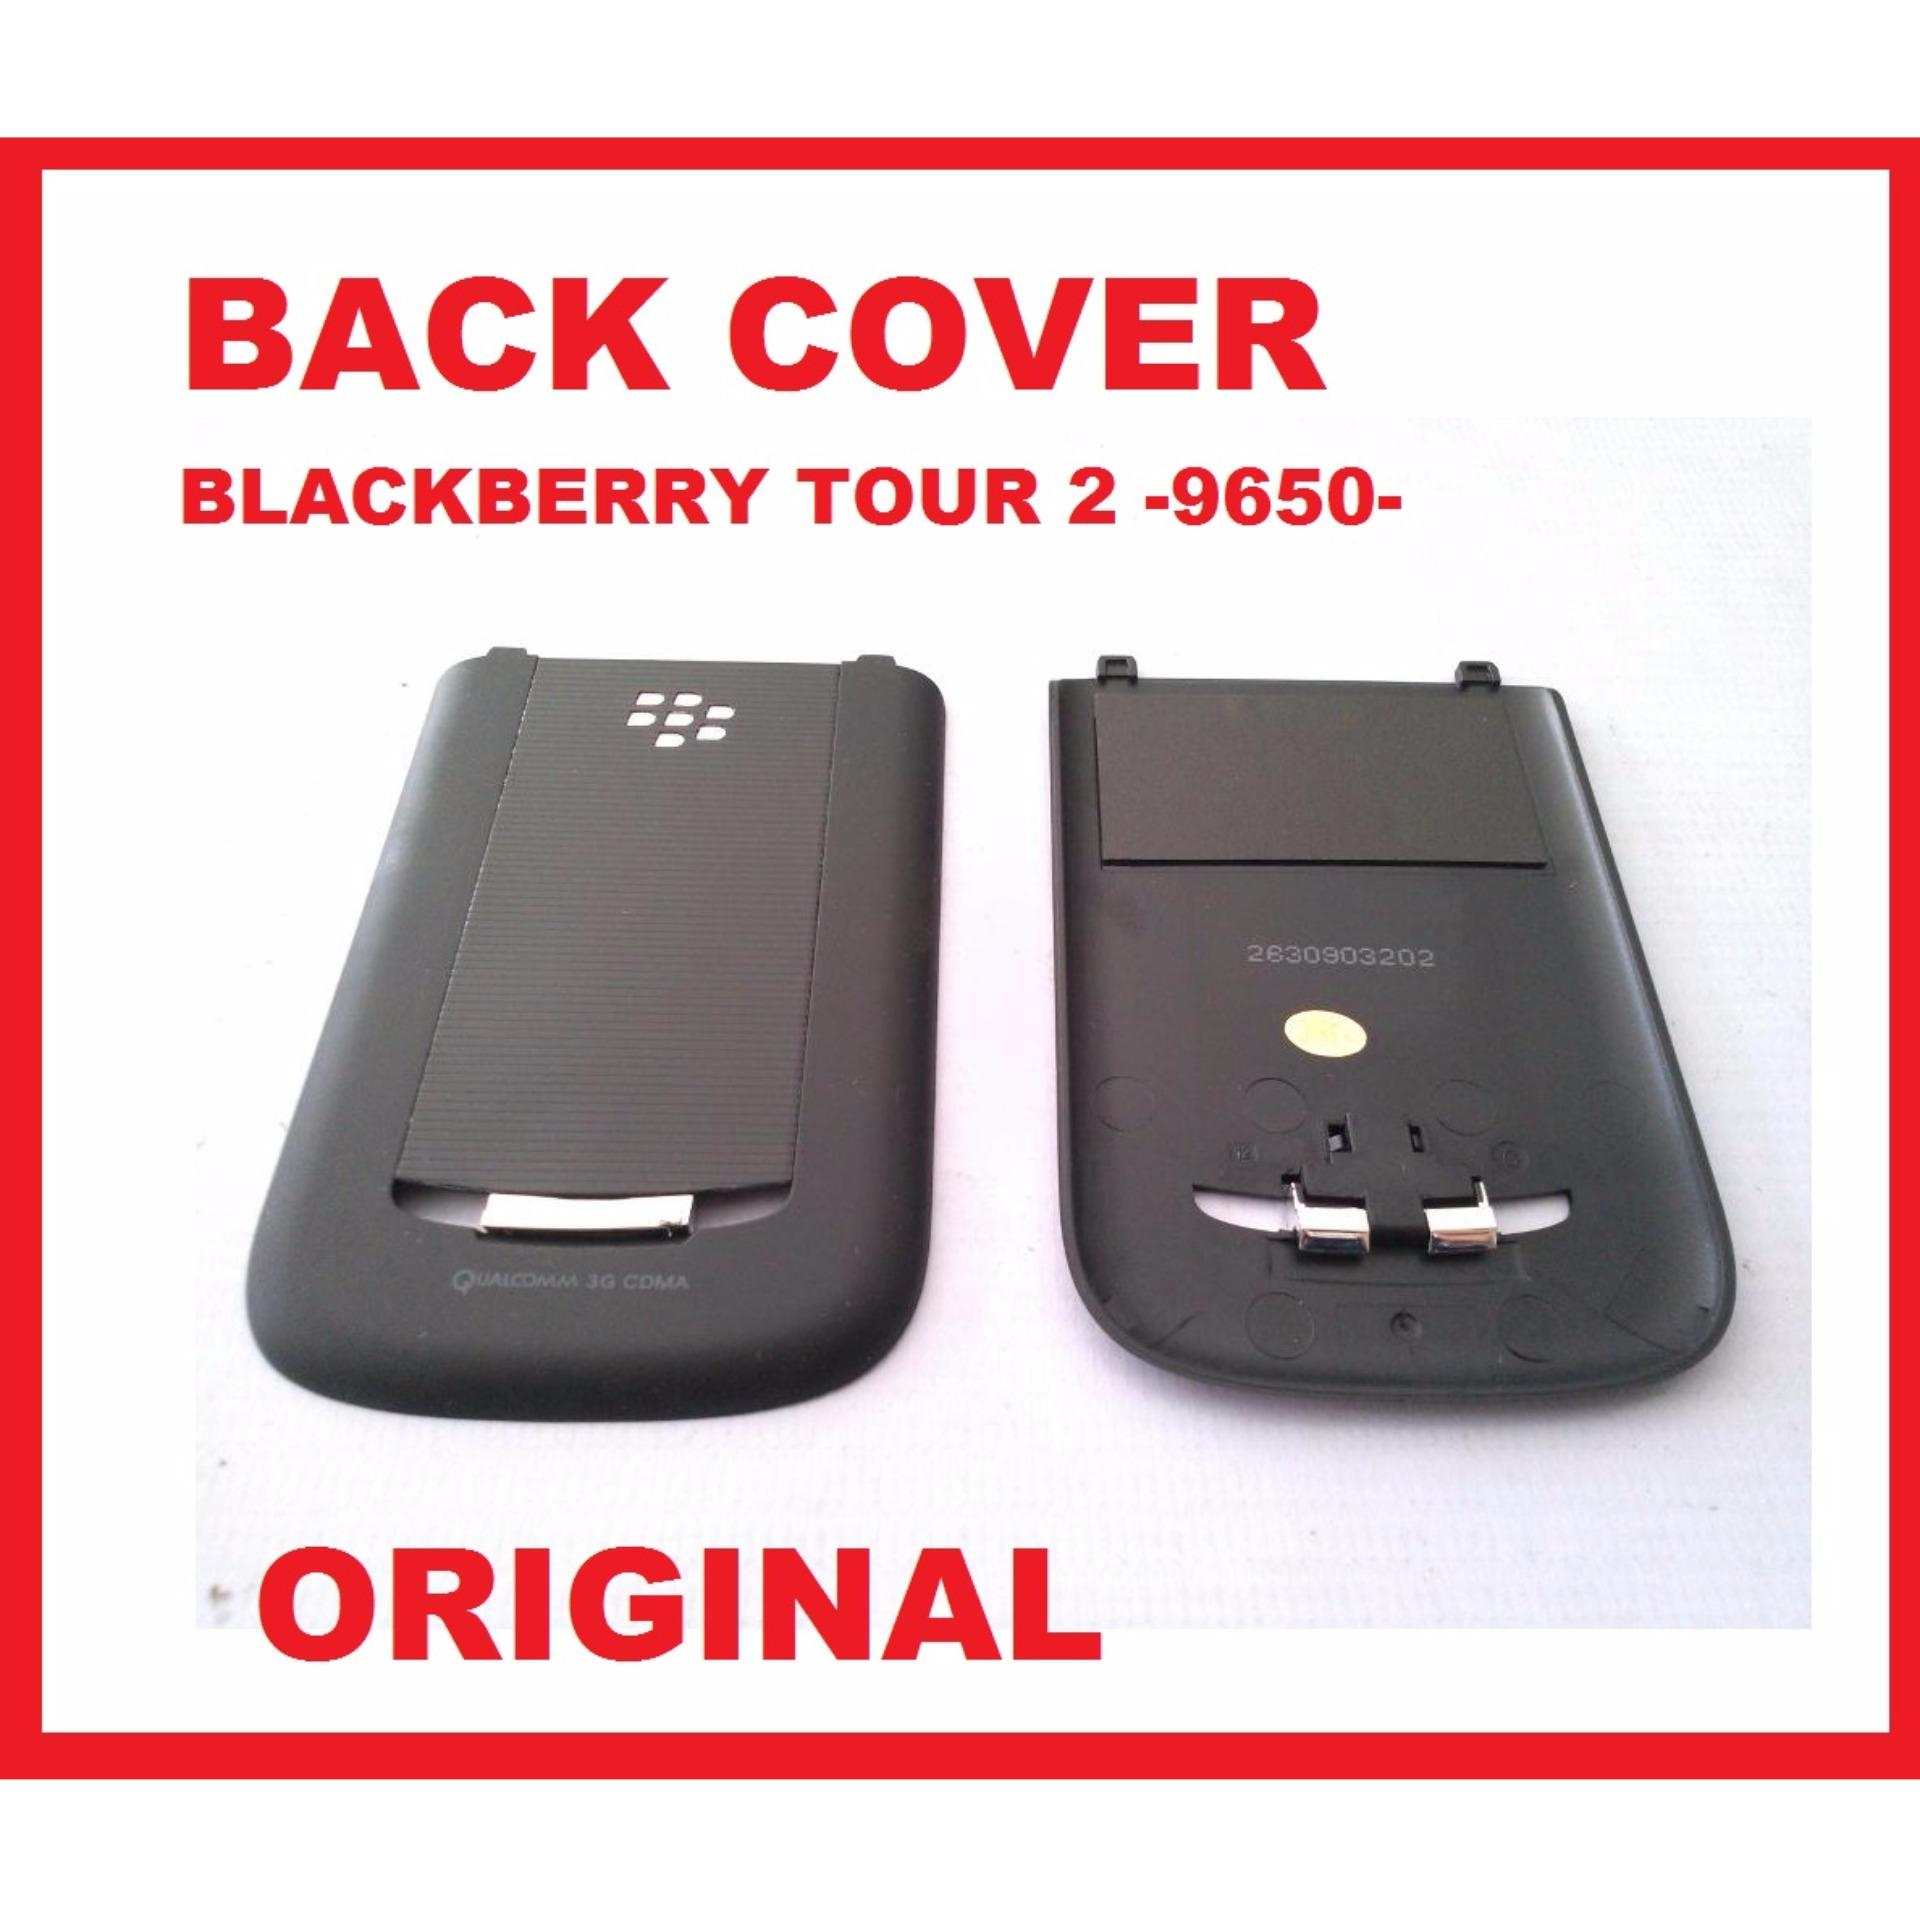 Kehebatan Sony Xperia Z1 C6609 L39 L39h C6906 C6603 Black Battery Back Cover Z3 Tutup Battre Blackberry 9650 Tour 2 Door Baterai Casing Belakang Original 700018